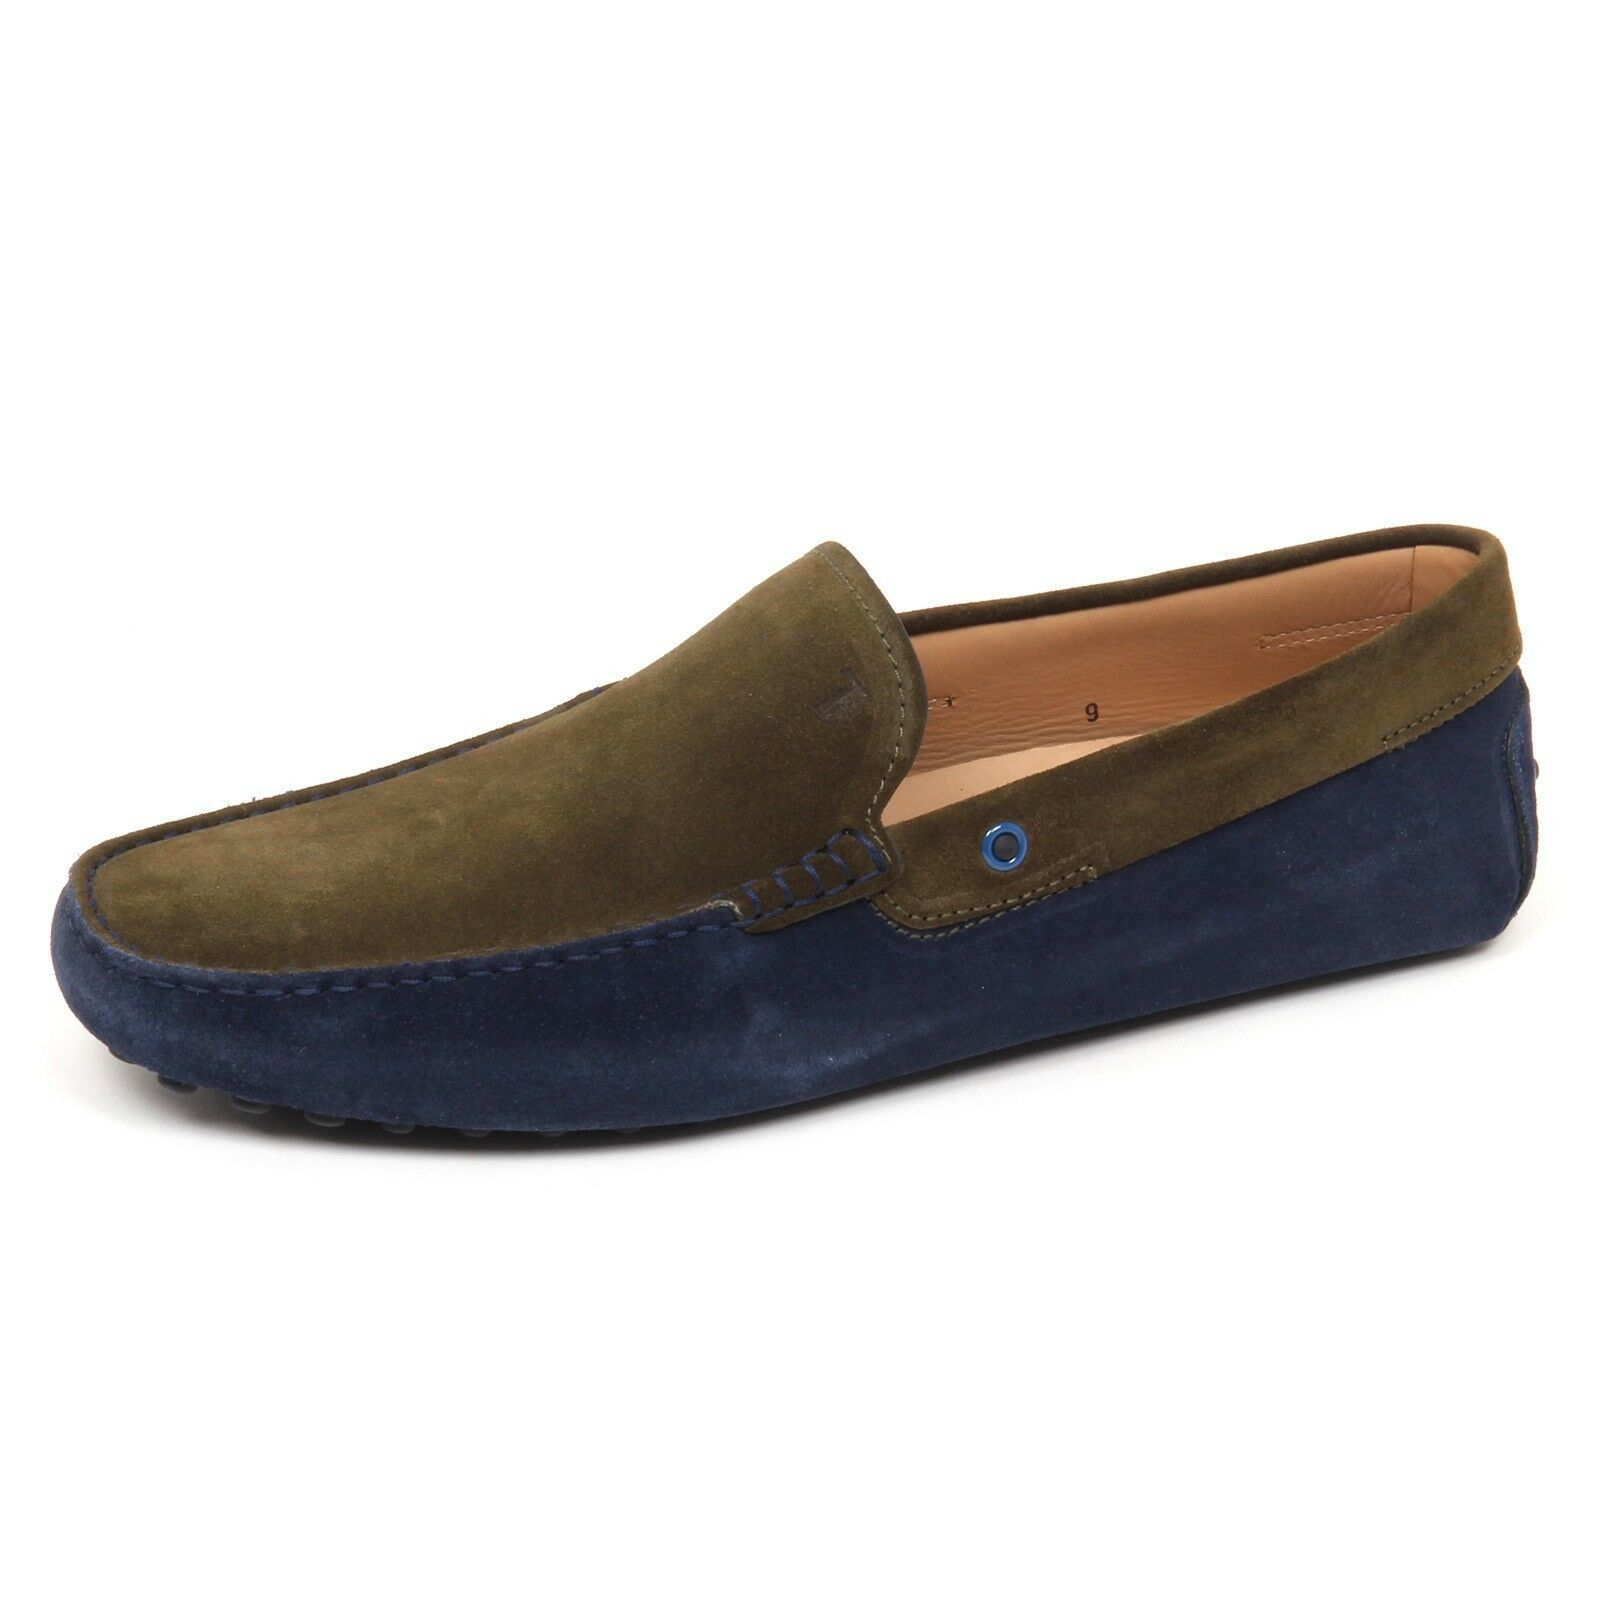 E3690 mocassino uomo blu/green TOD'S scarpe suede loafer shoe man